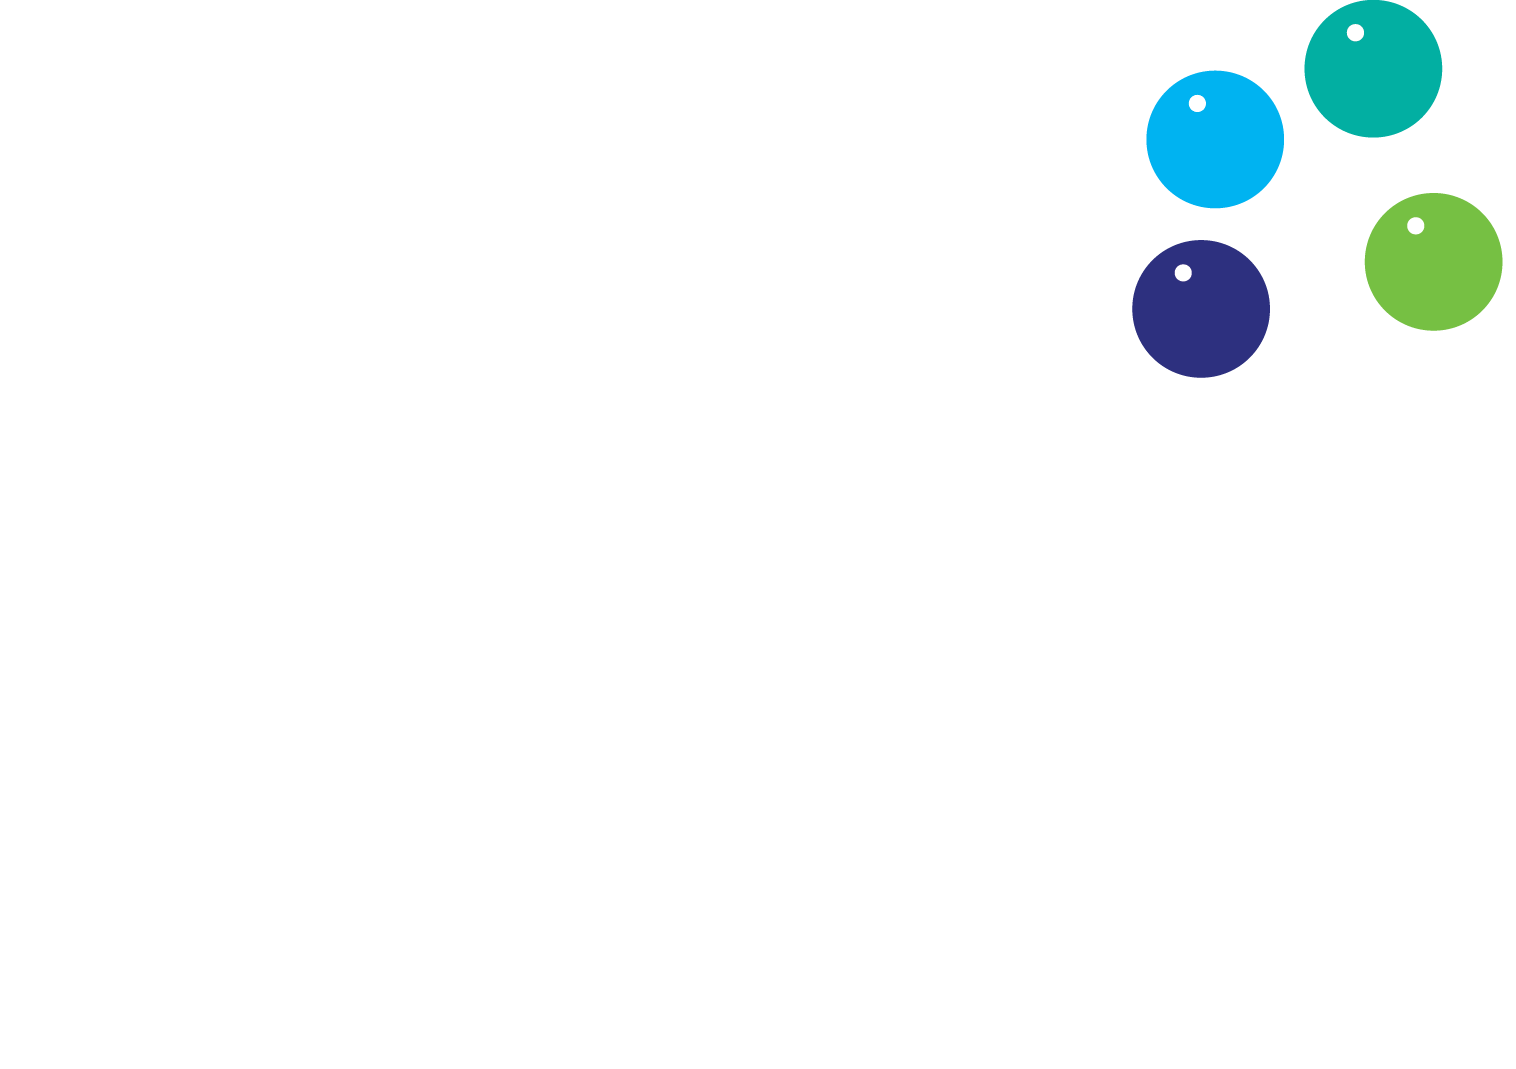 HEL - Haute Ecole de la Ville de Liège